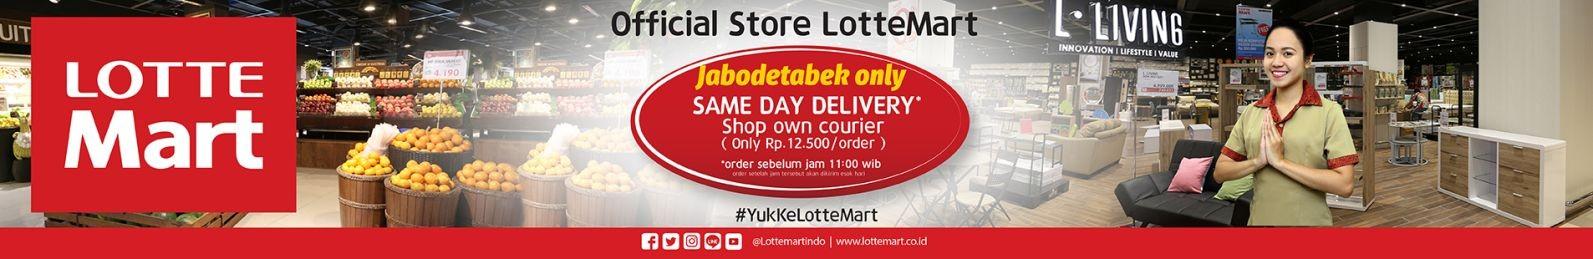 LotteMart Indonesia